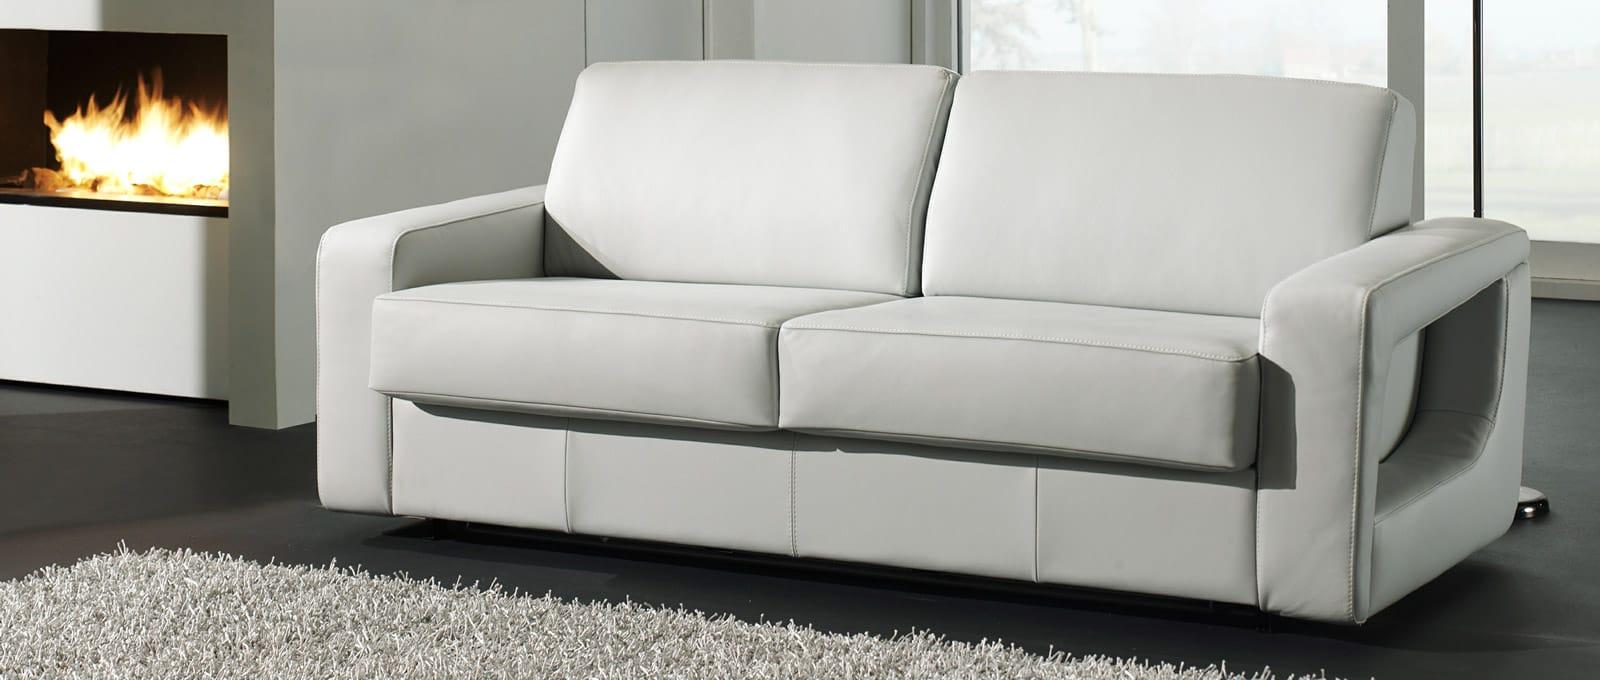 bettsofa mit lattenrost echtleder vicco schlafsofa sofa. Black Bedroom Furniture Sets. Home Design Ideas